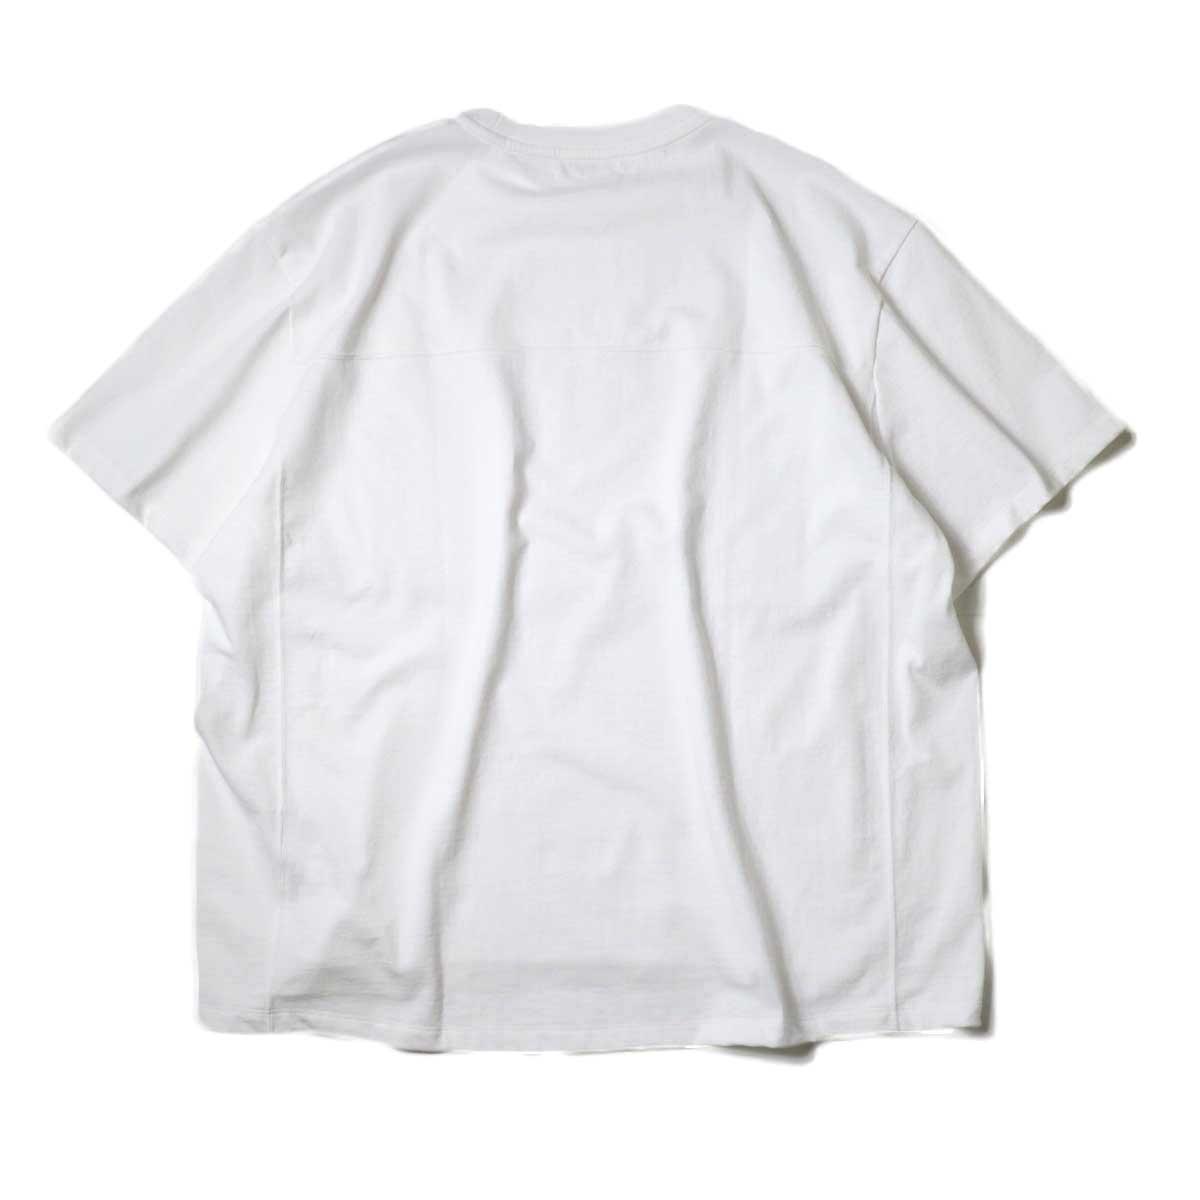 alvana / Protect Football S/S Tee (White)背面